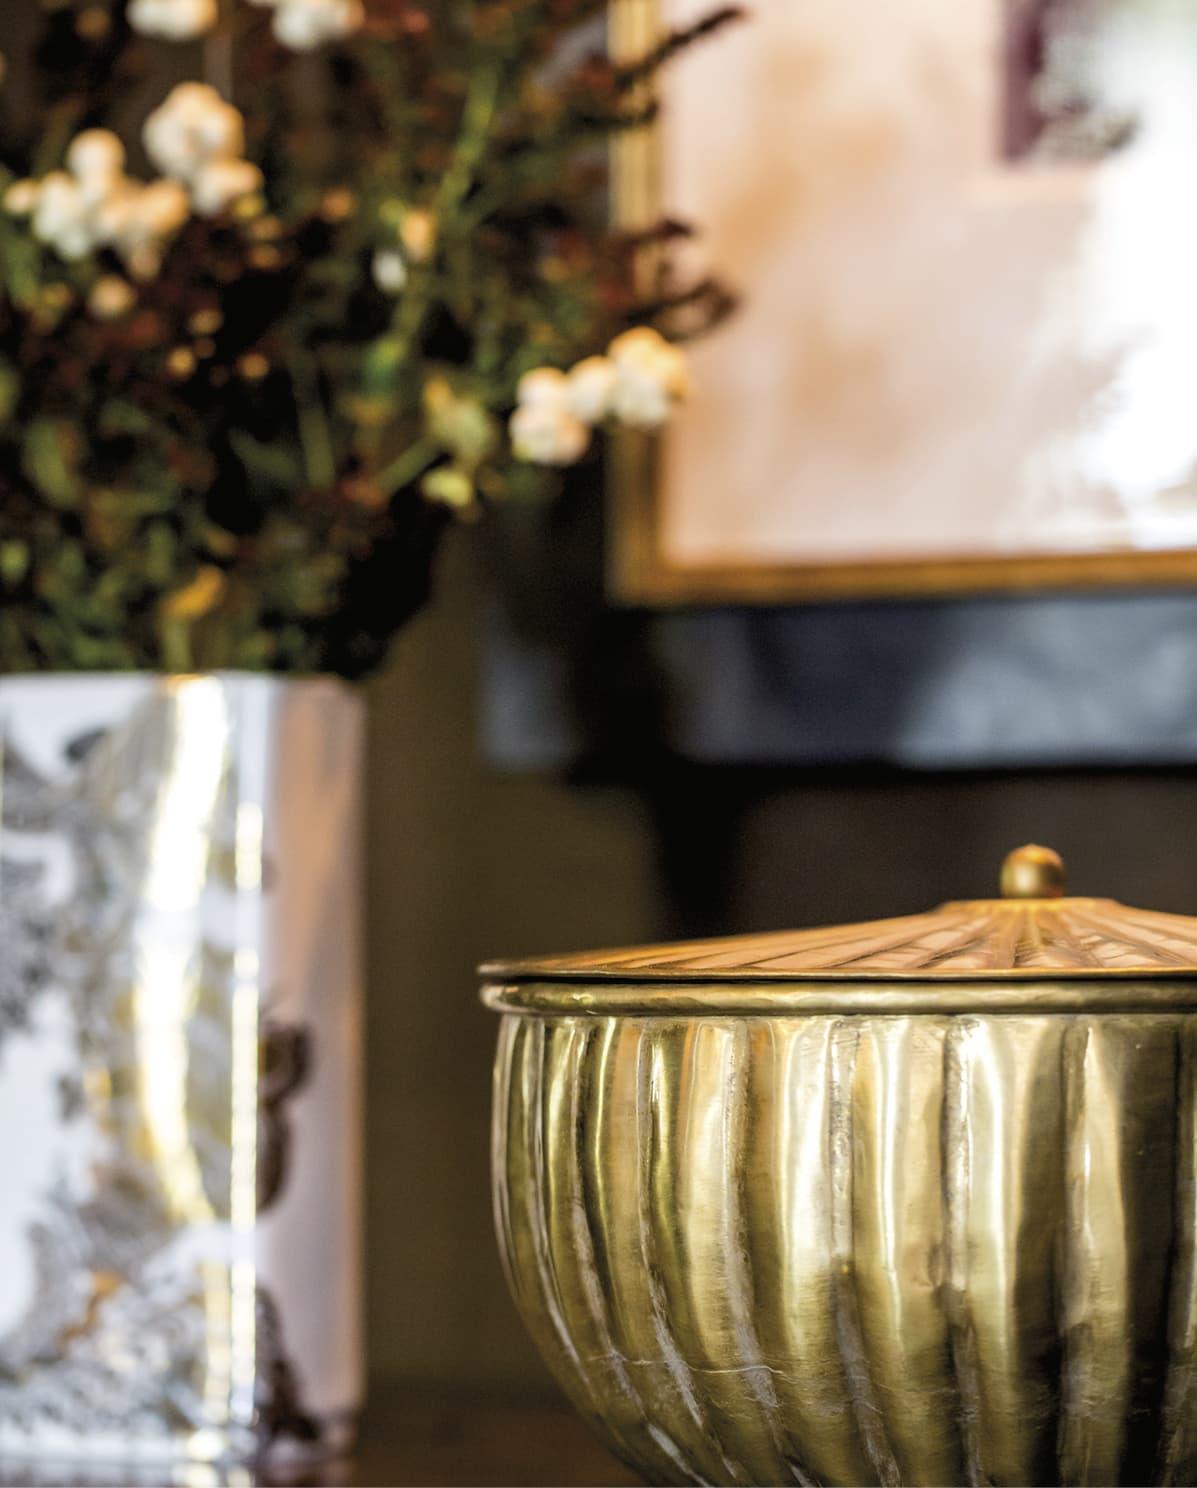 Closeup of a gold bowl